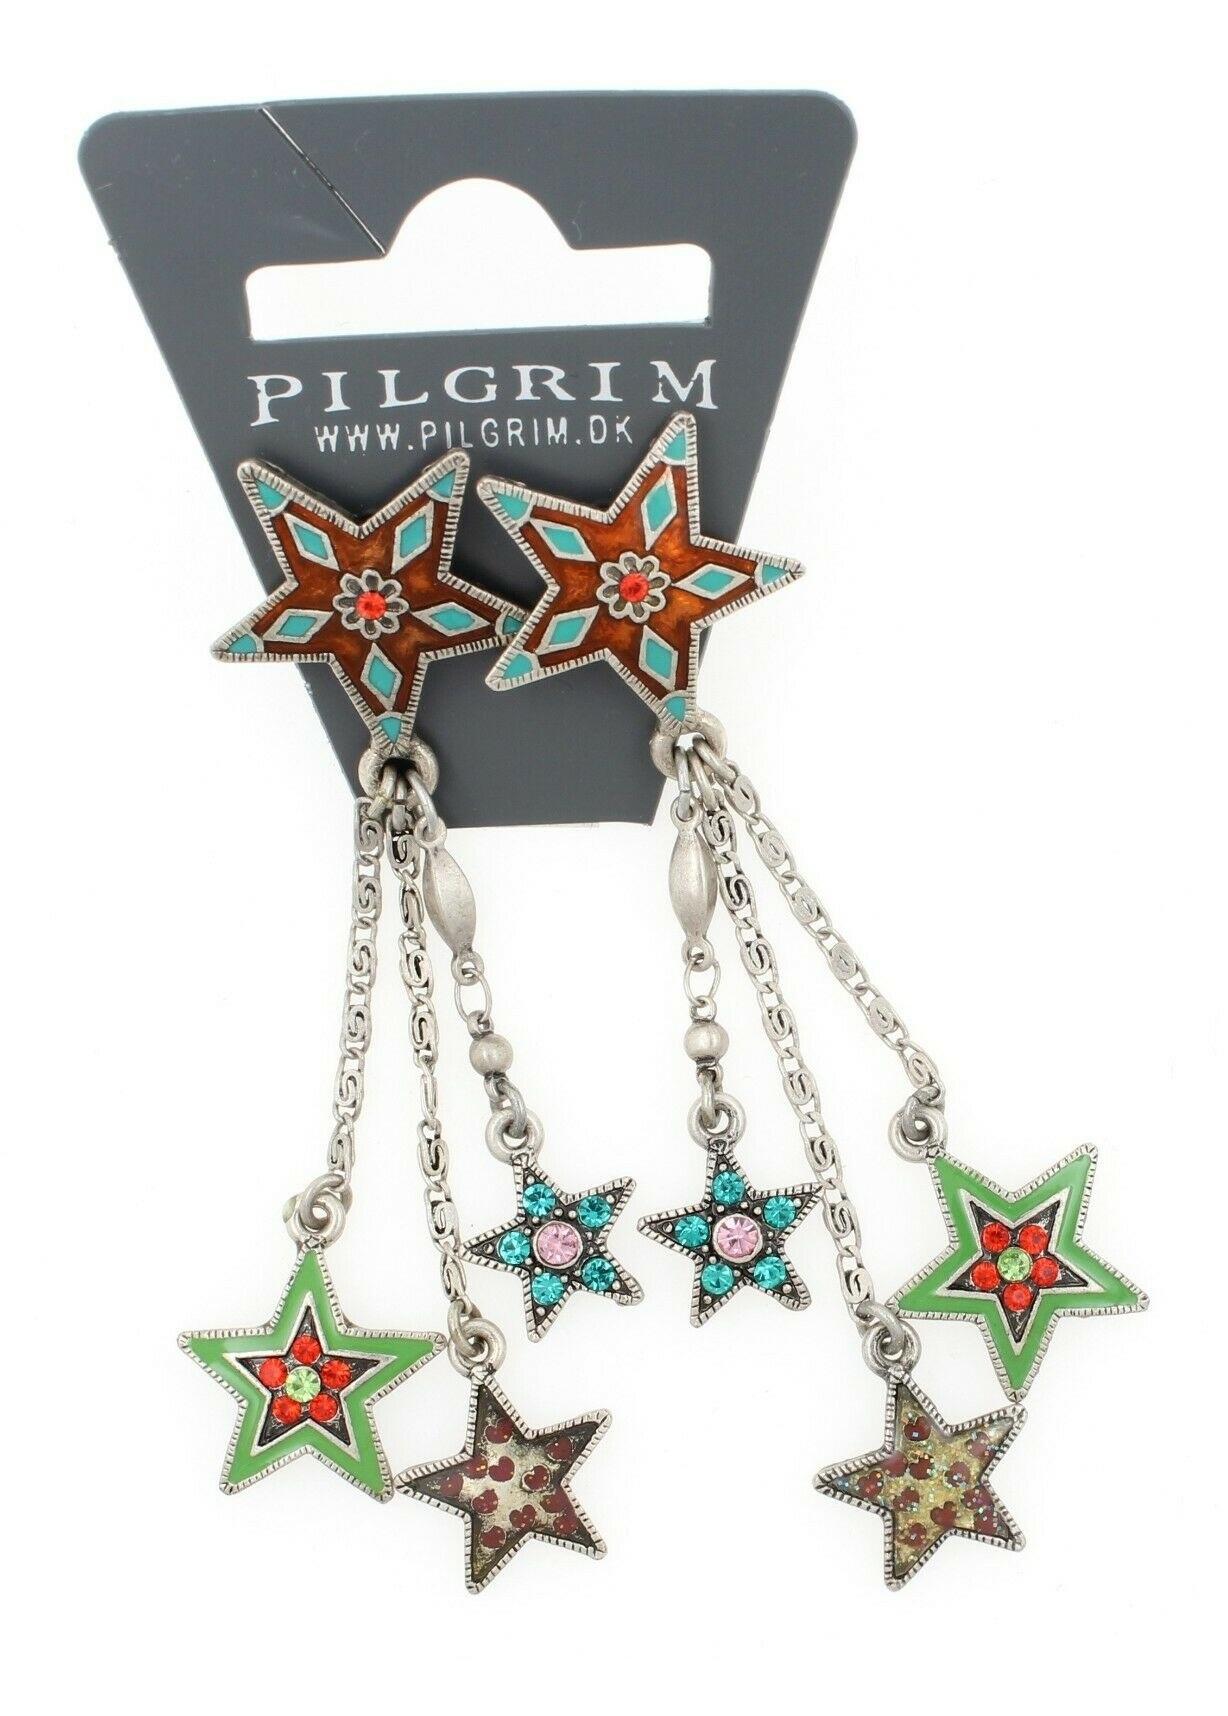 PILGRIM - STARS - Cascade Earrings - Silver Plate/Multi-Colour Swarovski BNWT